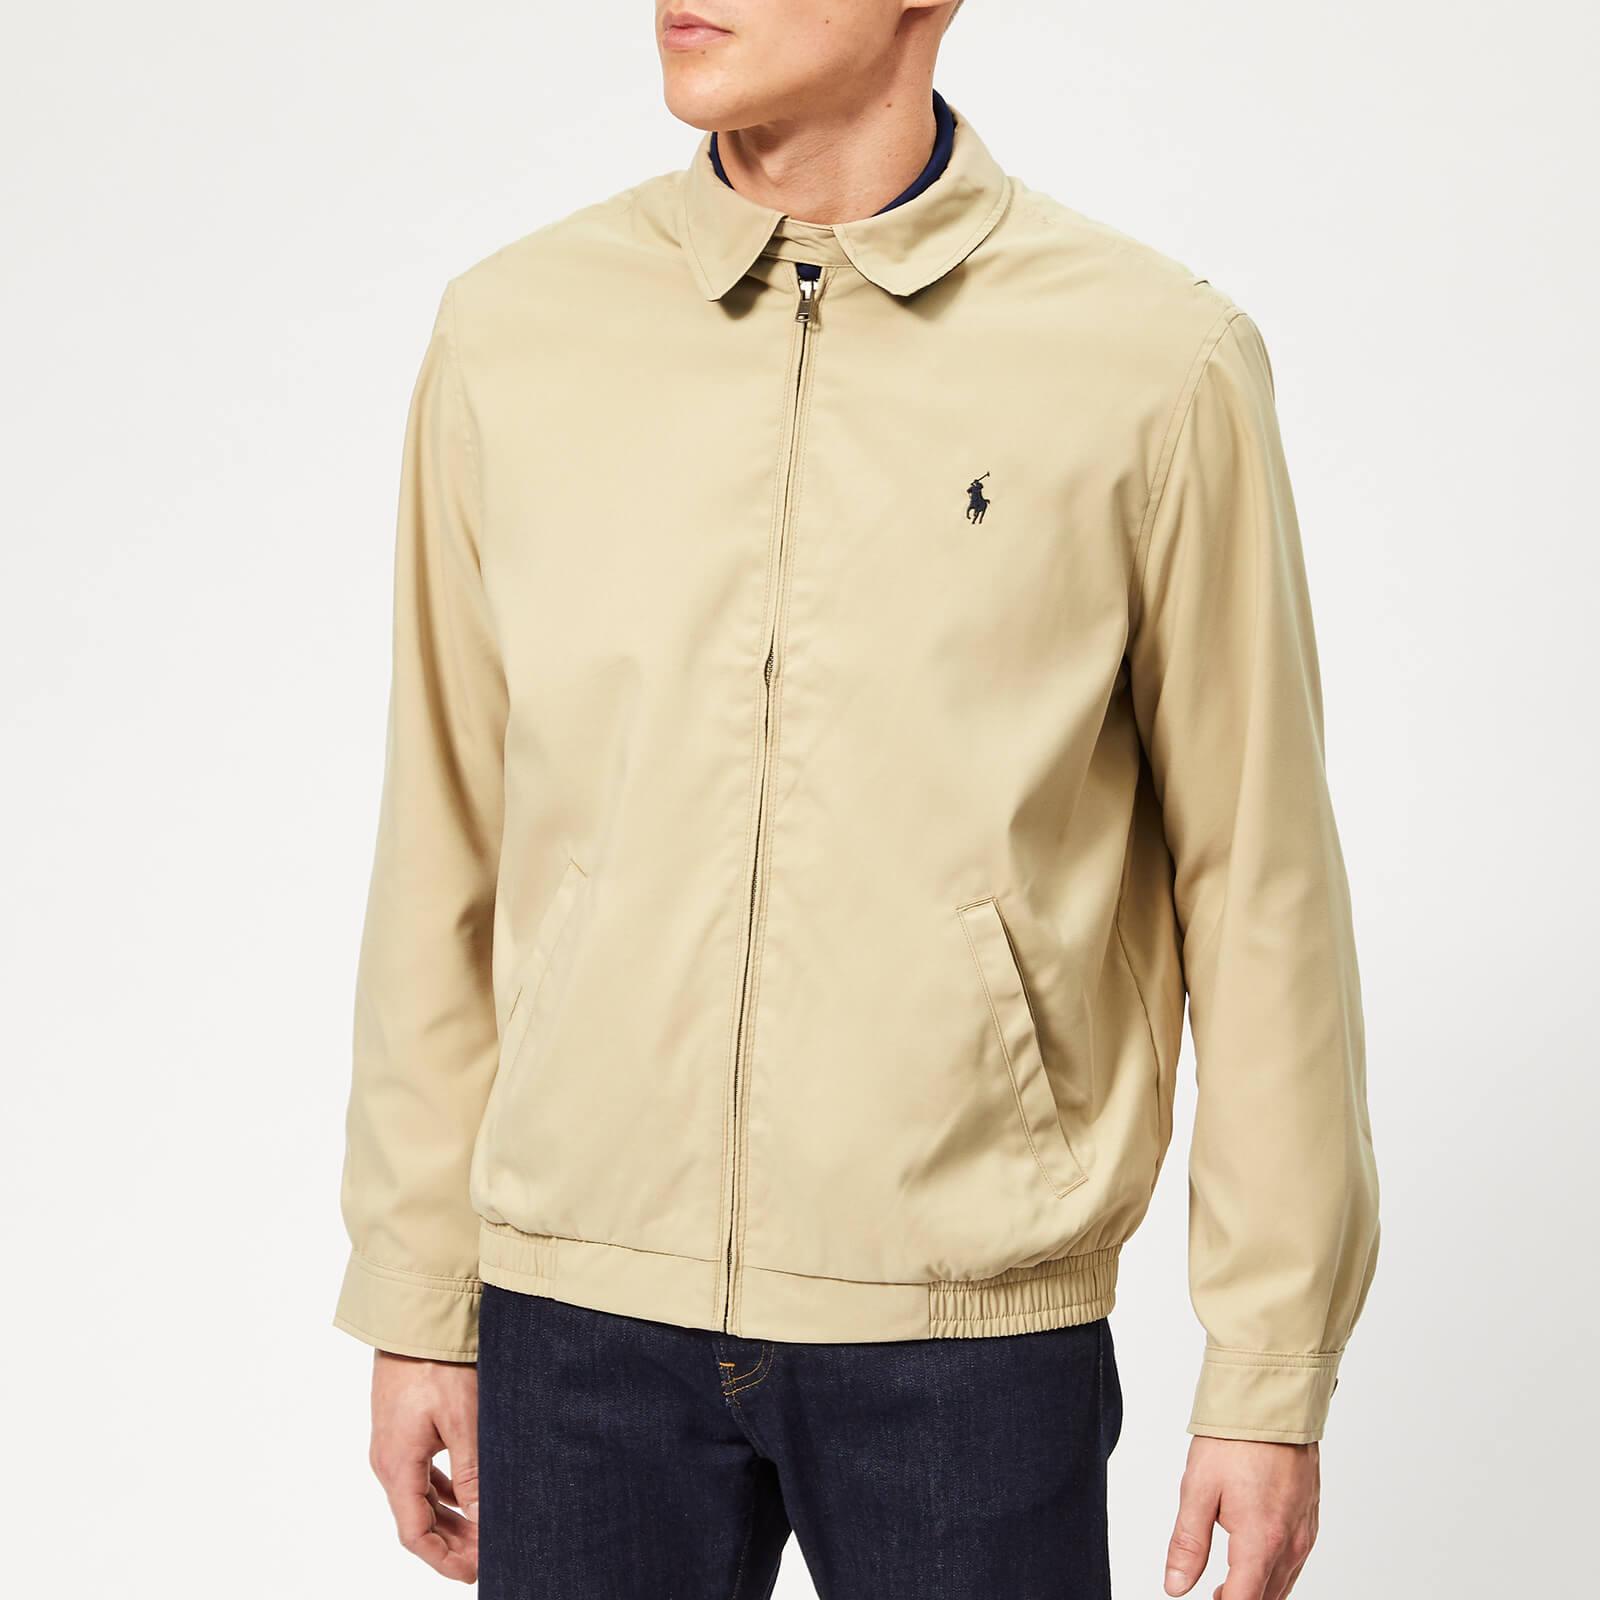 b0b6d5a7c Polo Ralph Lauren Men's Bi-Swing Jacket - Khaki Uniform